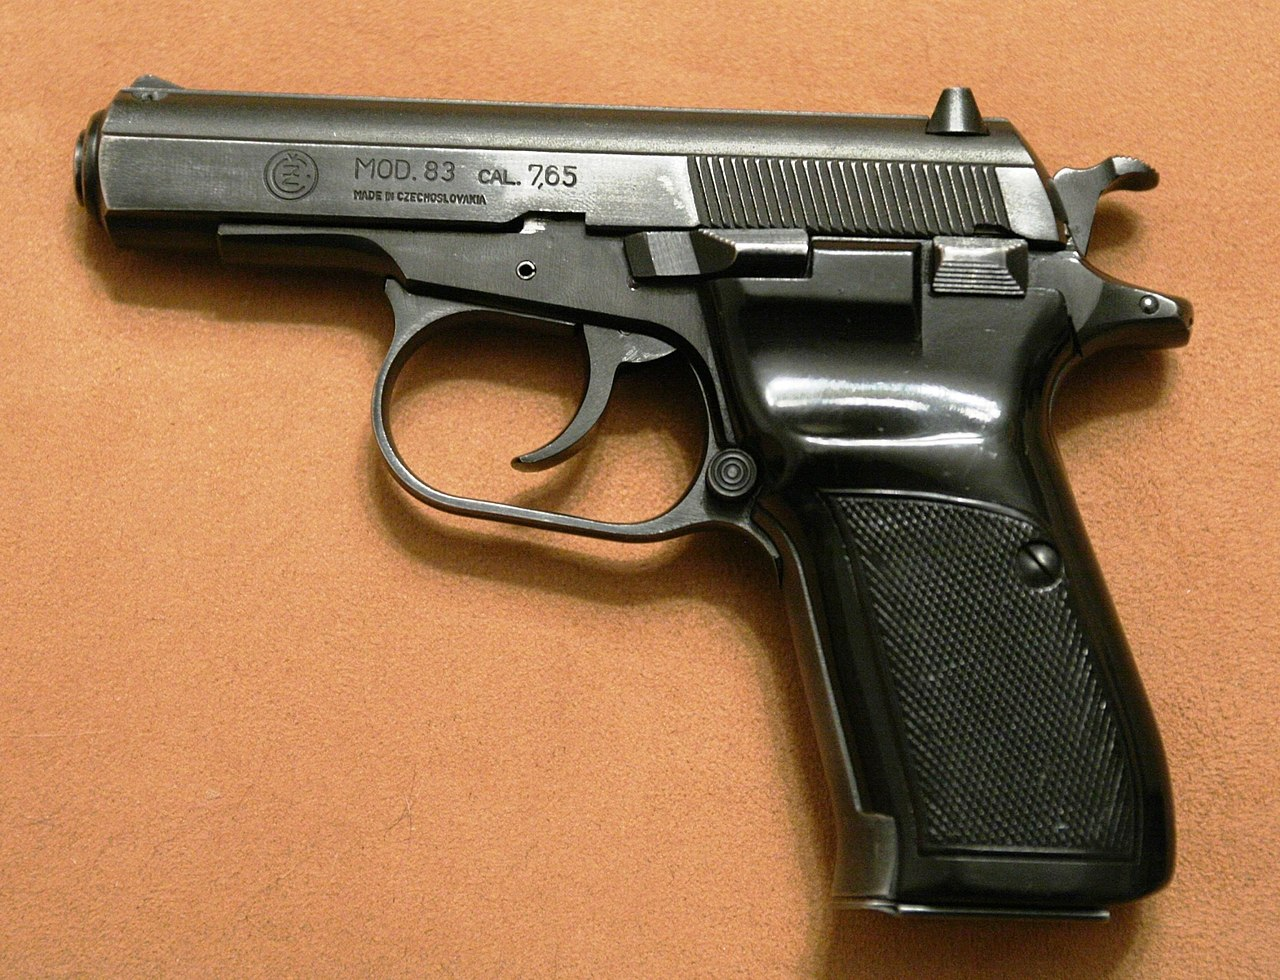 List of pistols